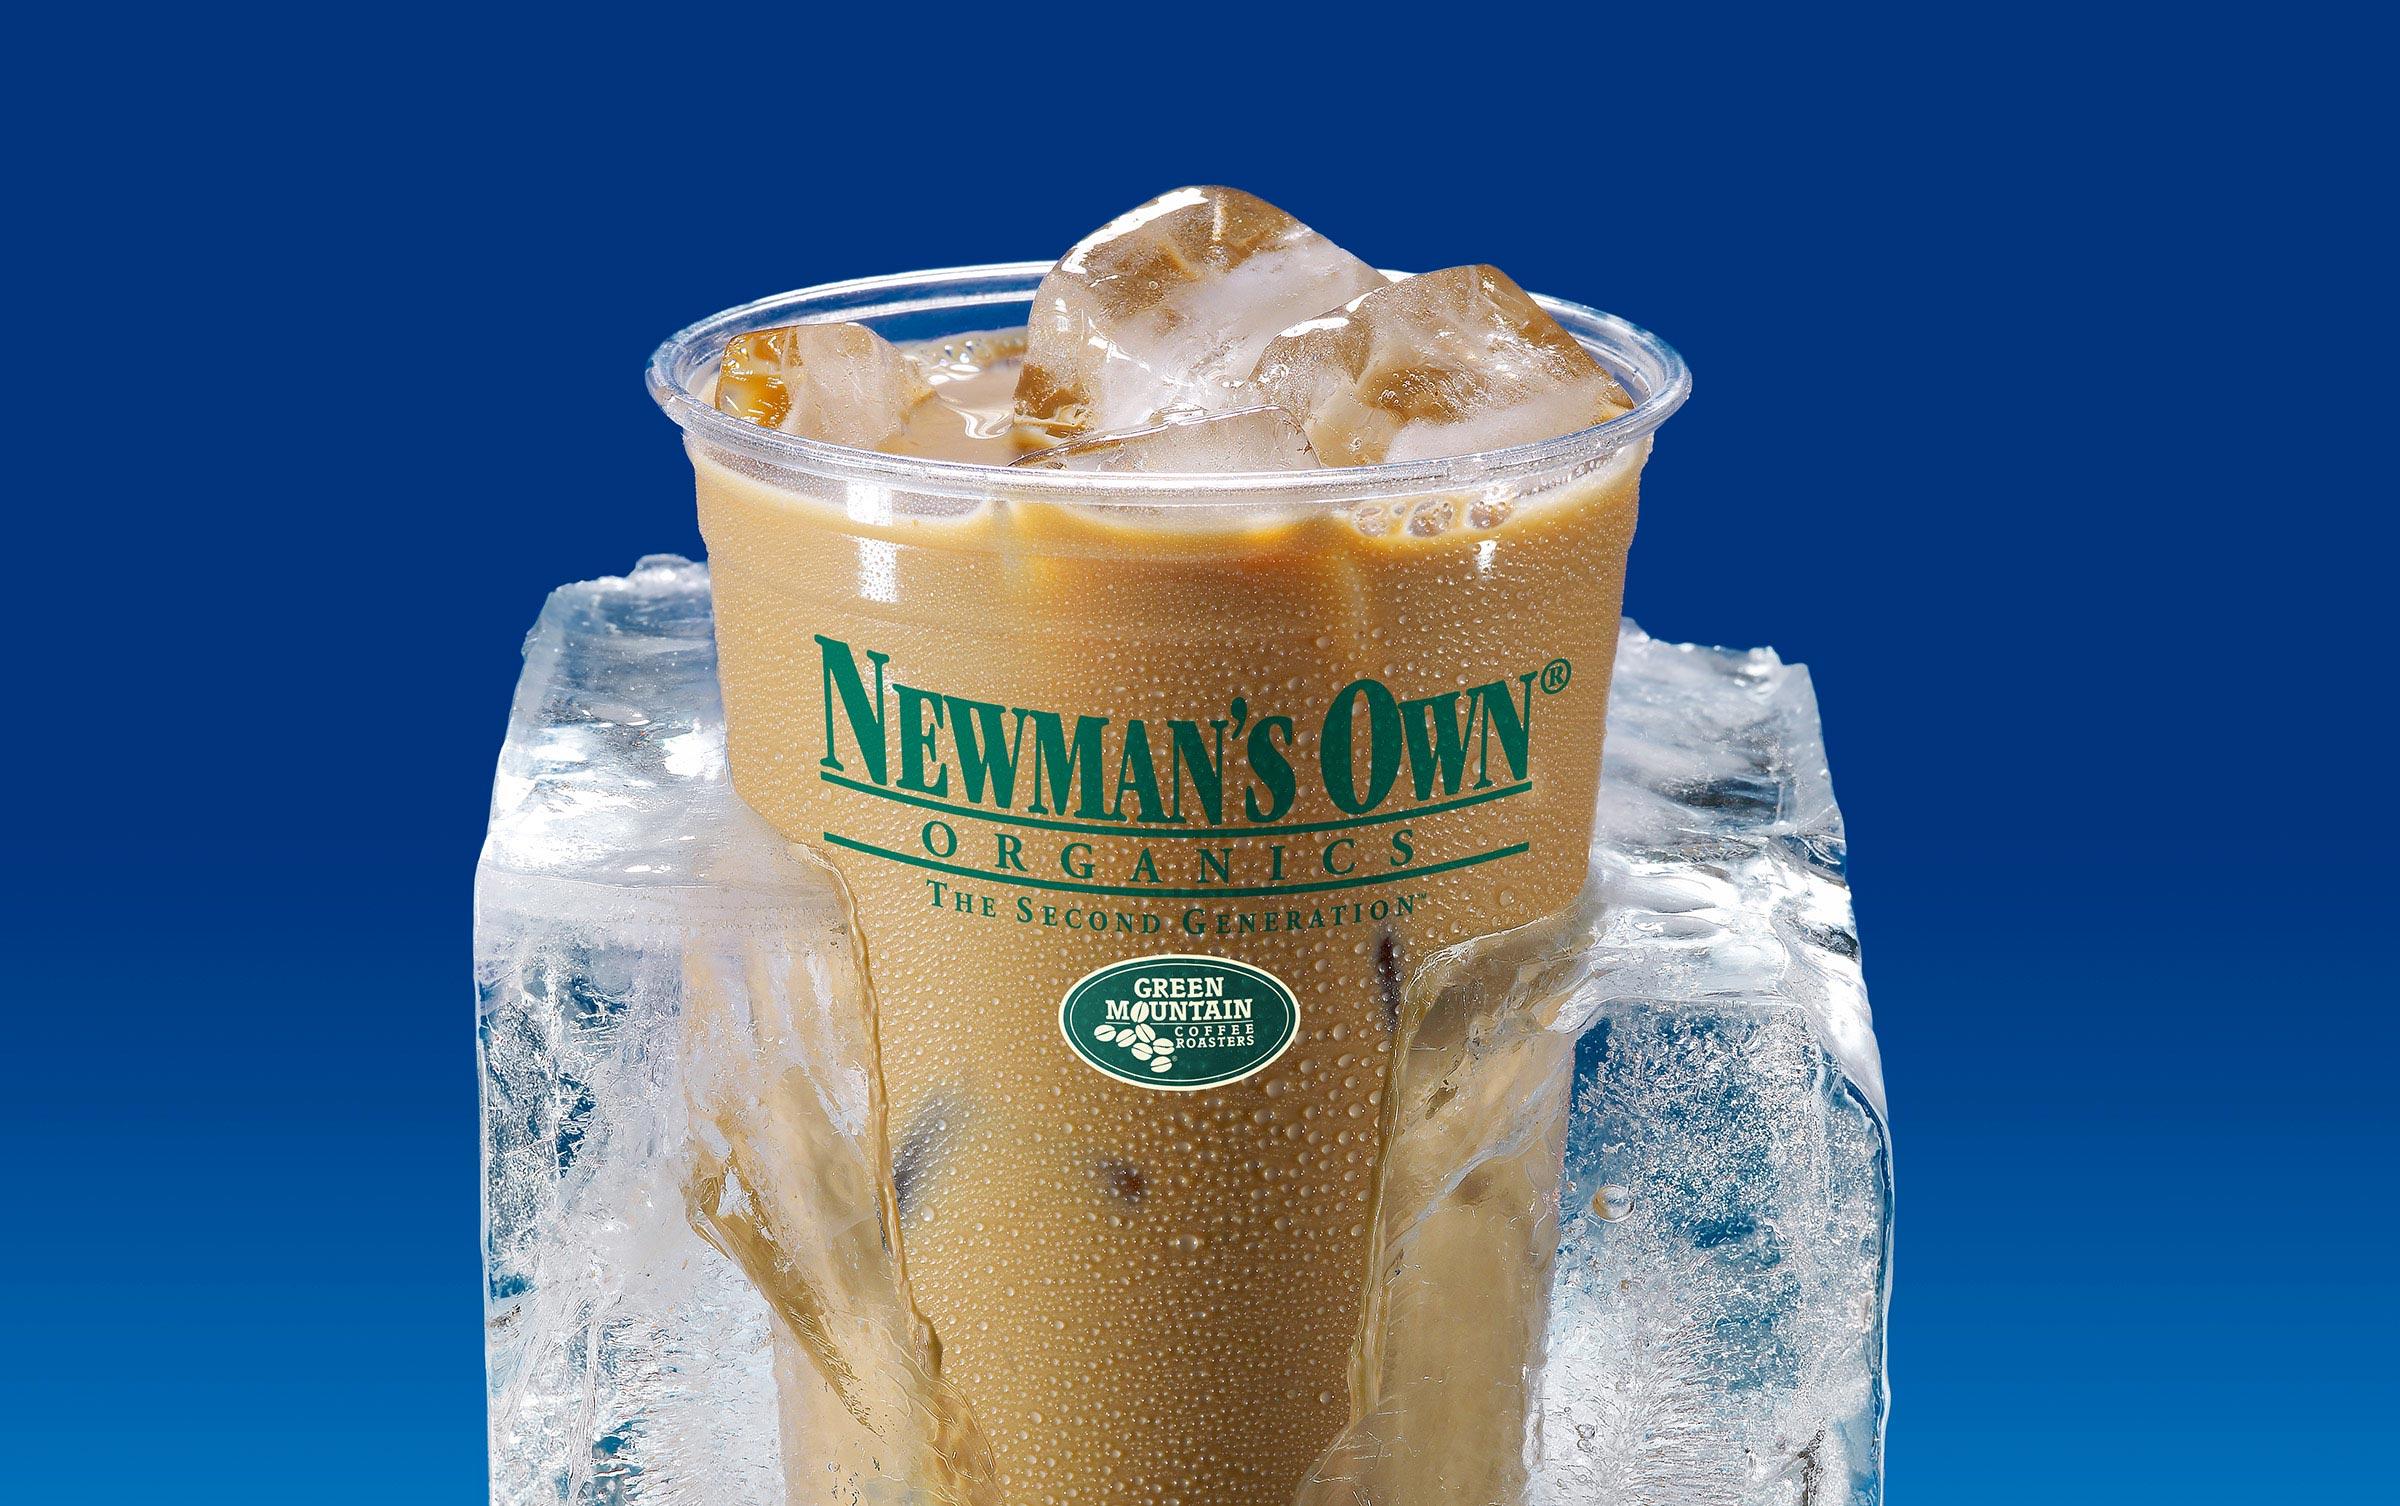 McDonalds introduces iced coffee